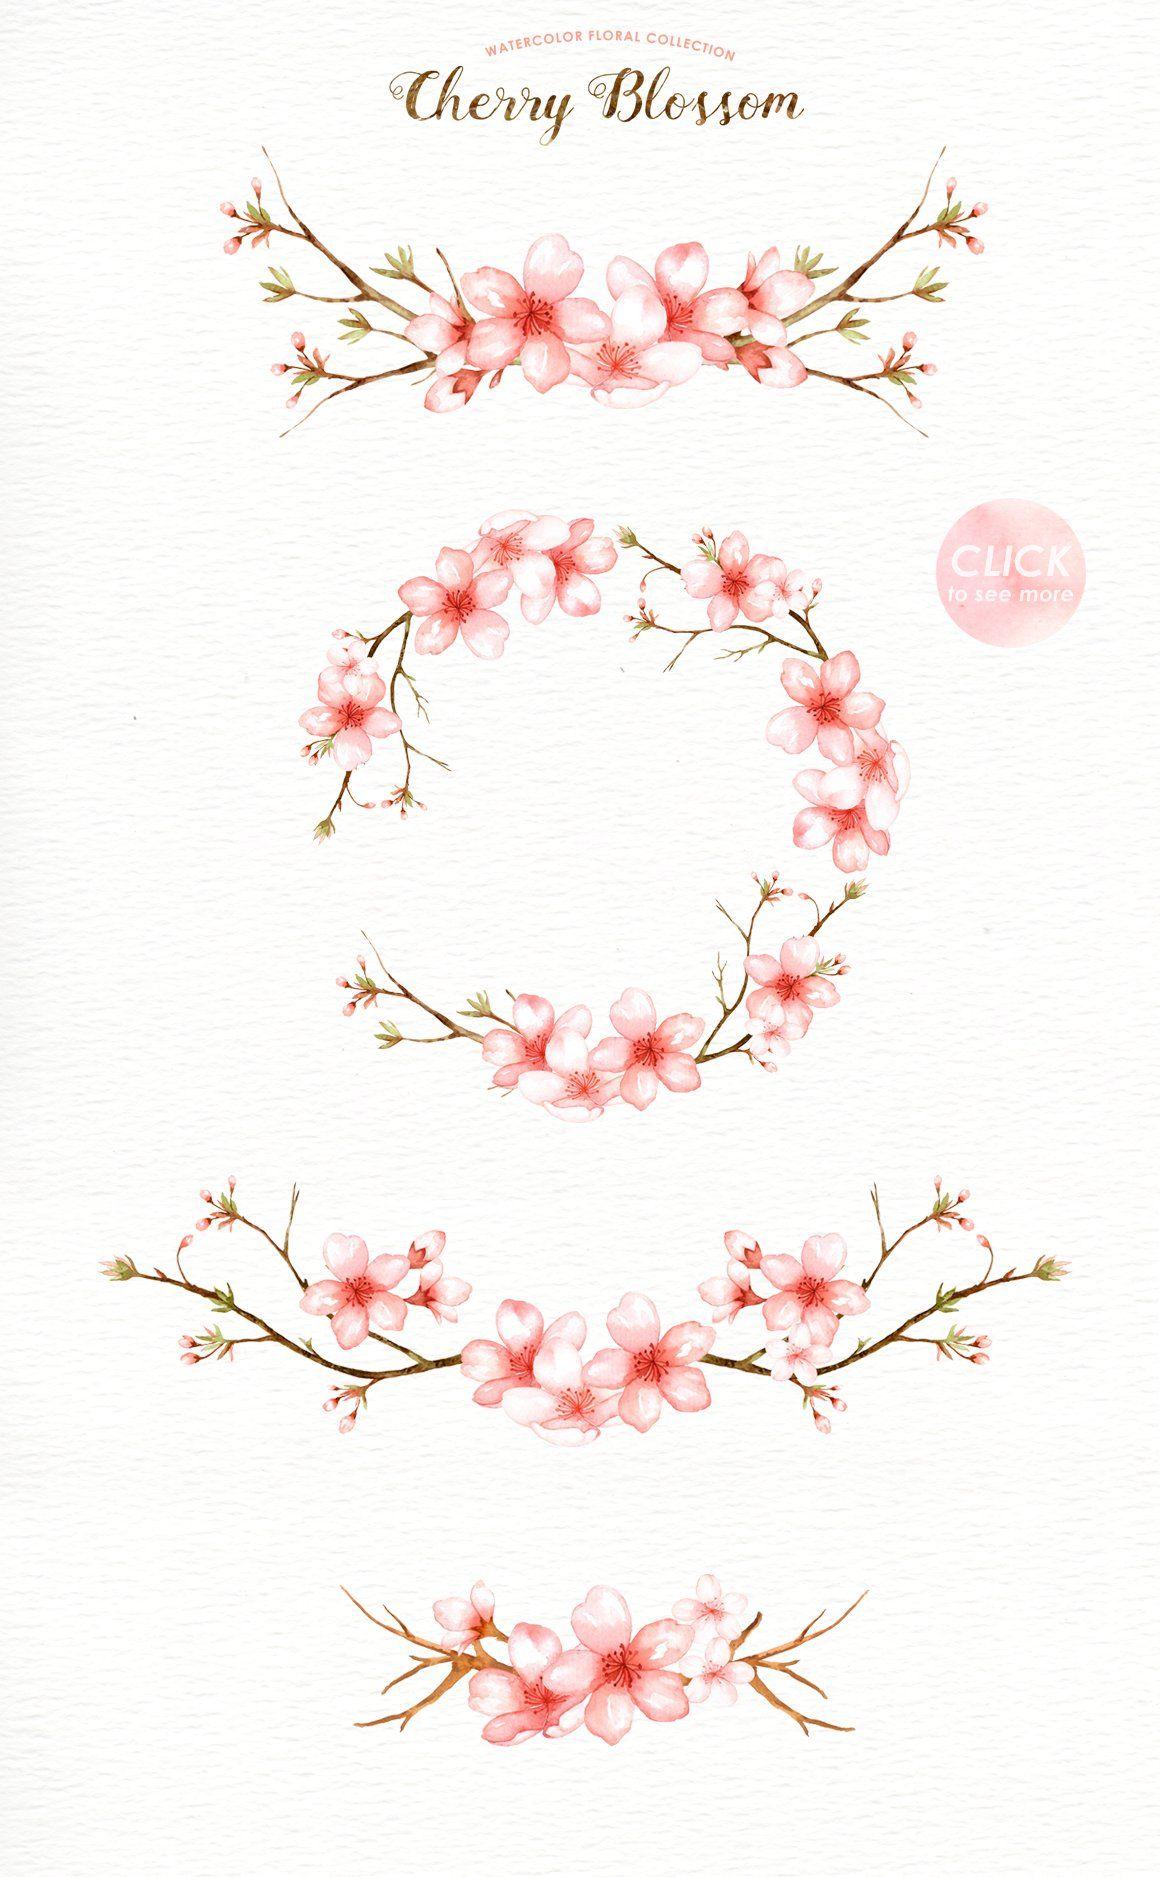 Cherry Blossom Watercolor Clip Art Cherry Blossom Watercolor Cherry Blossom Tattoo Cherry Blossom Art